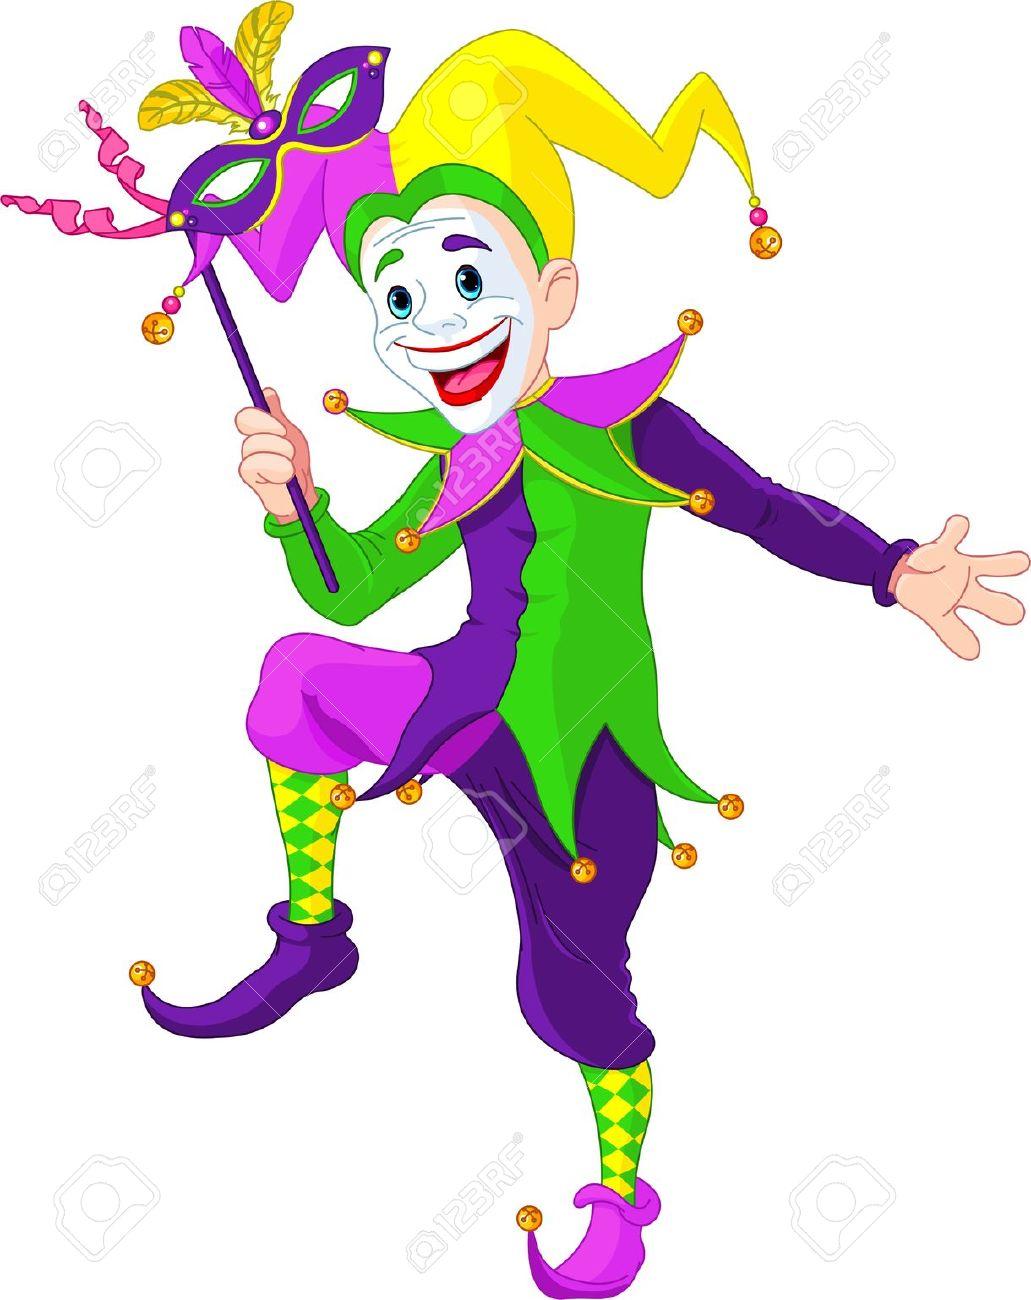 1031x1300 Clown Clipart, Suggestions For Clown Clipart, Download Clown Clipart